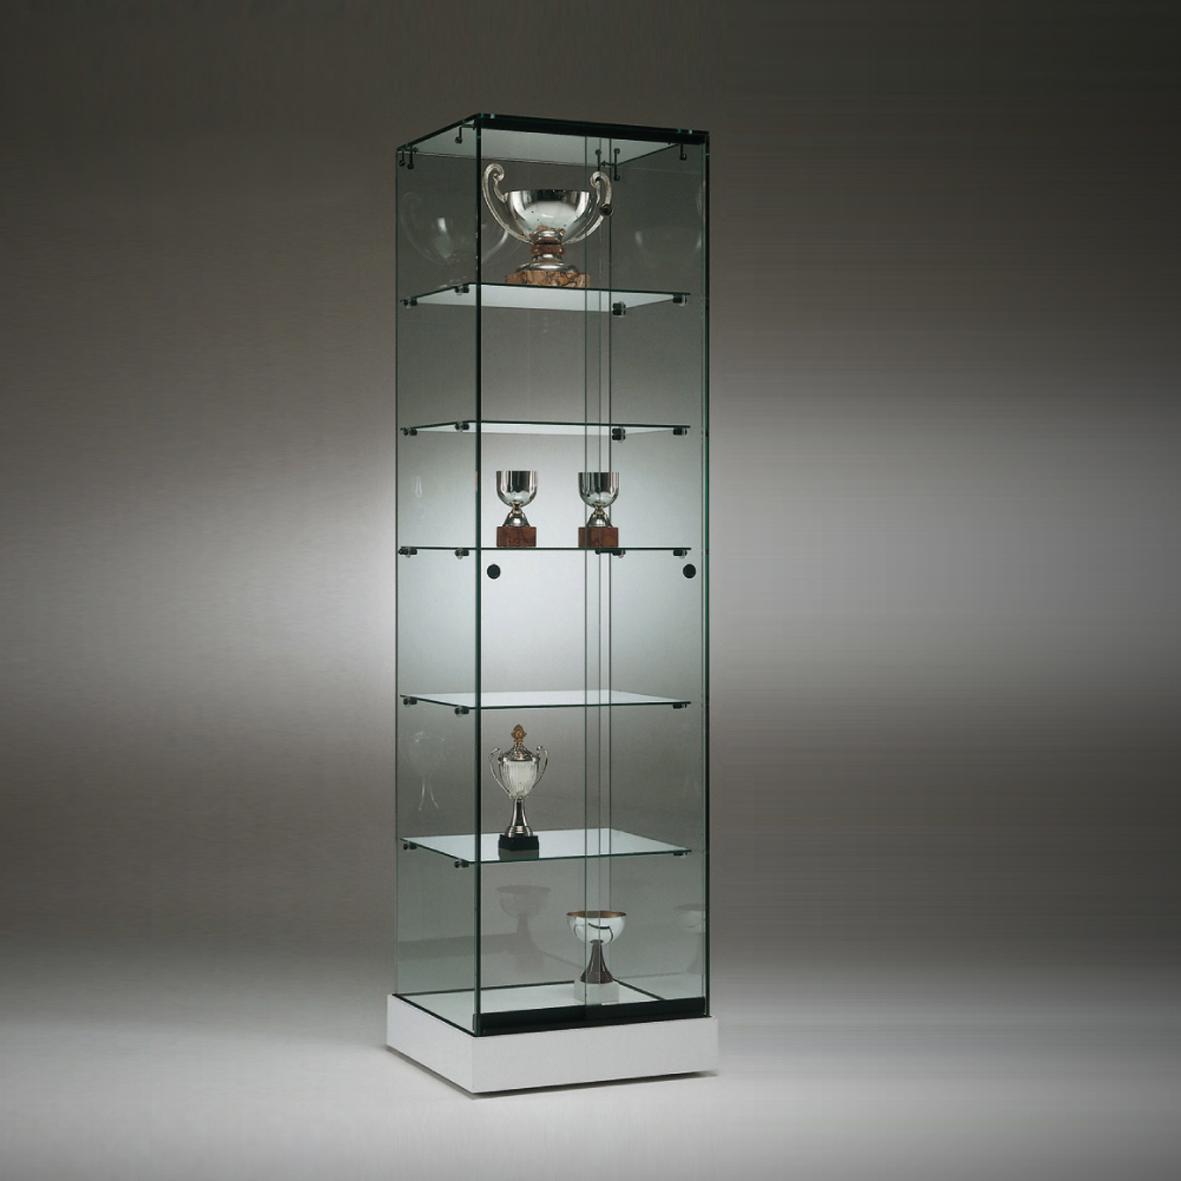 S5 Base Nova Trophy Frameless Glass Cabinet 1